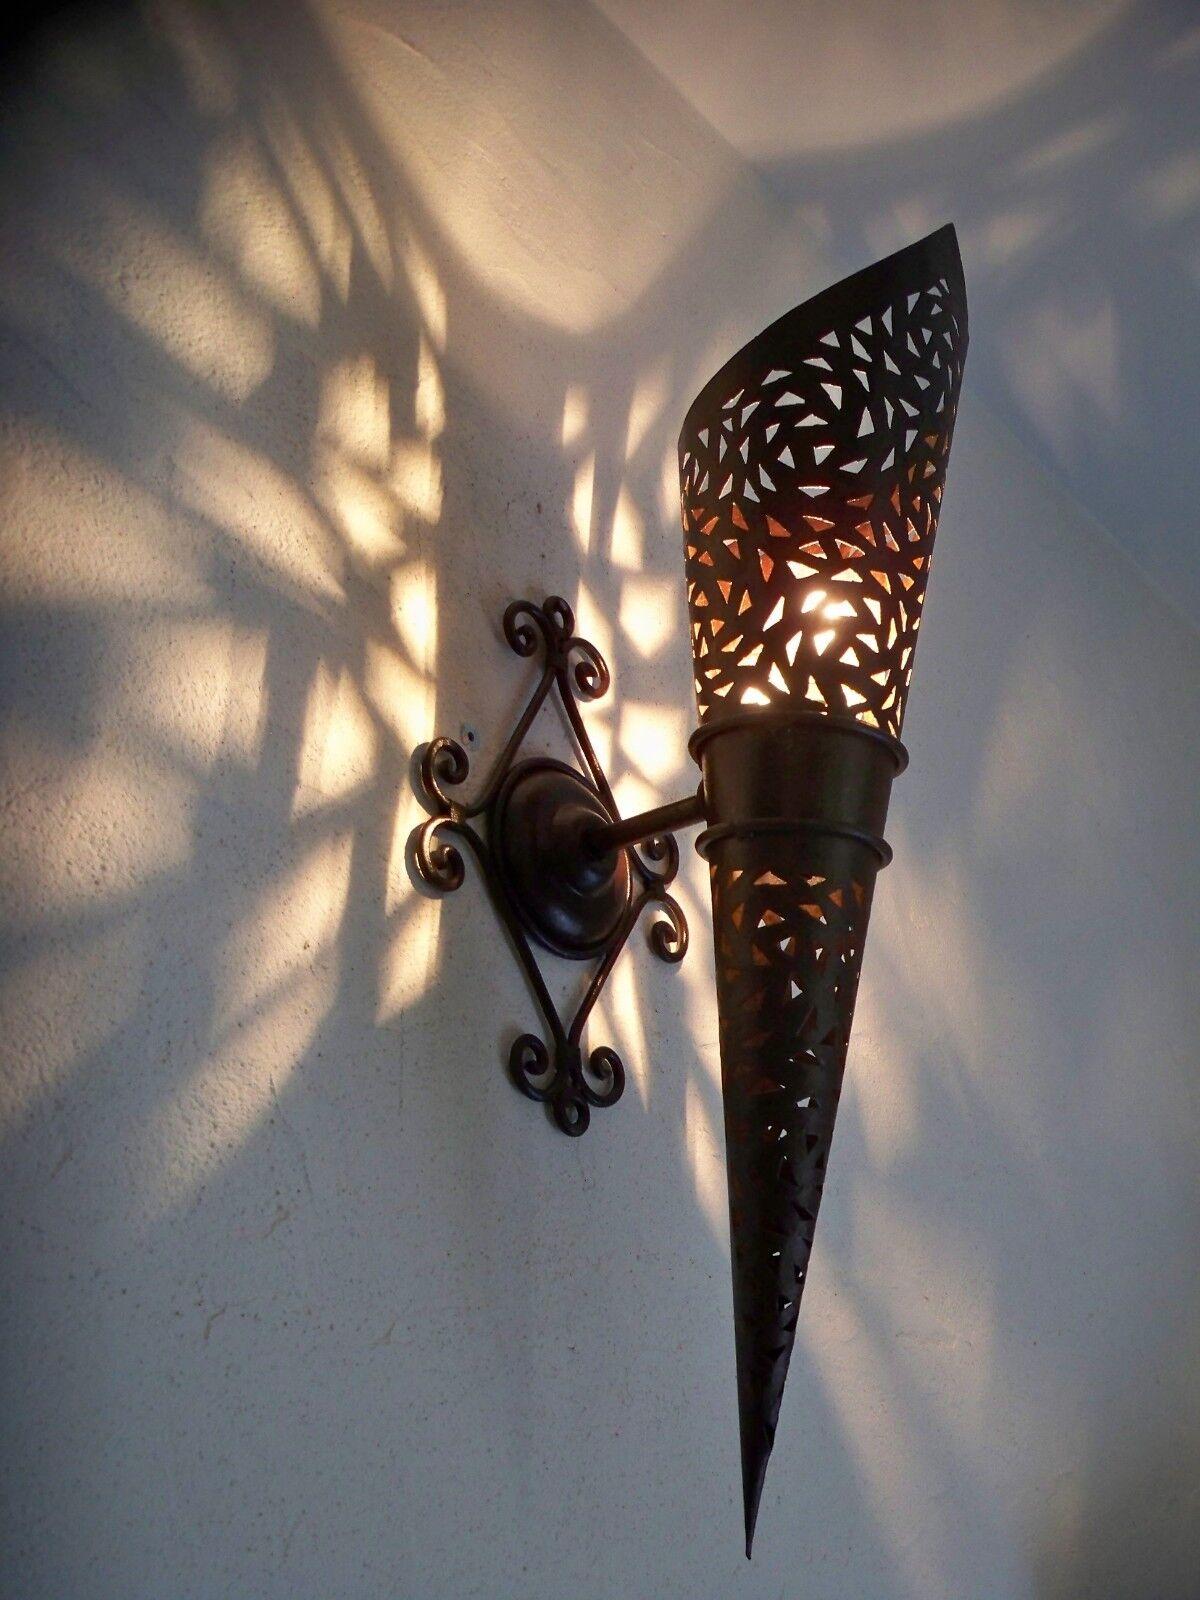 58 cm Marokkanische Orientalische Wandlampe Metall Wandleuchte Lampe lanterne